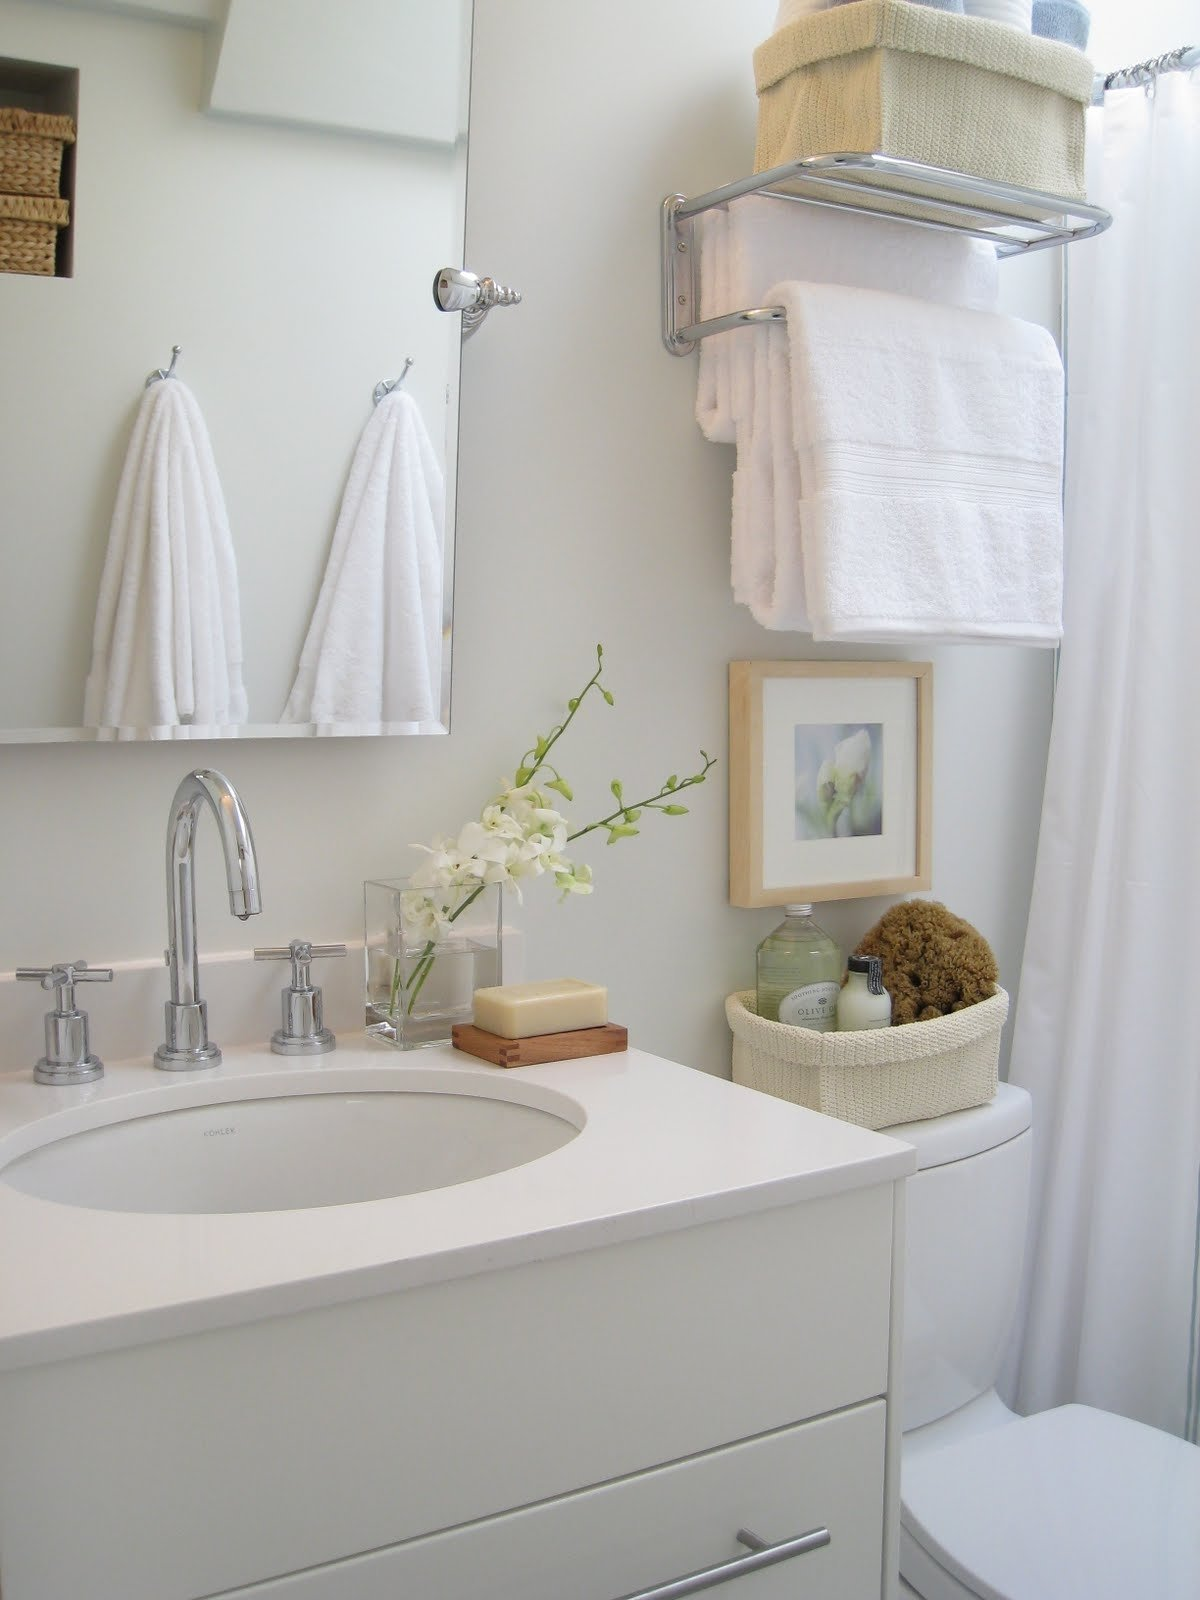 10 Trendy Bathroom Storage Ideas For Small Bathrooms